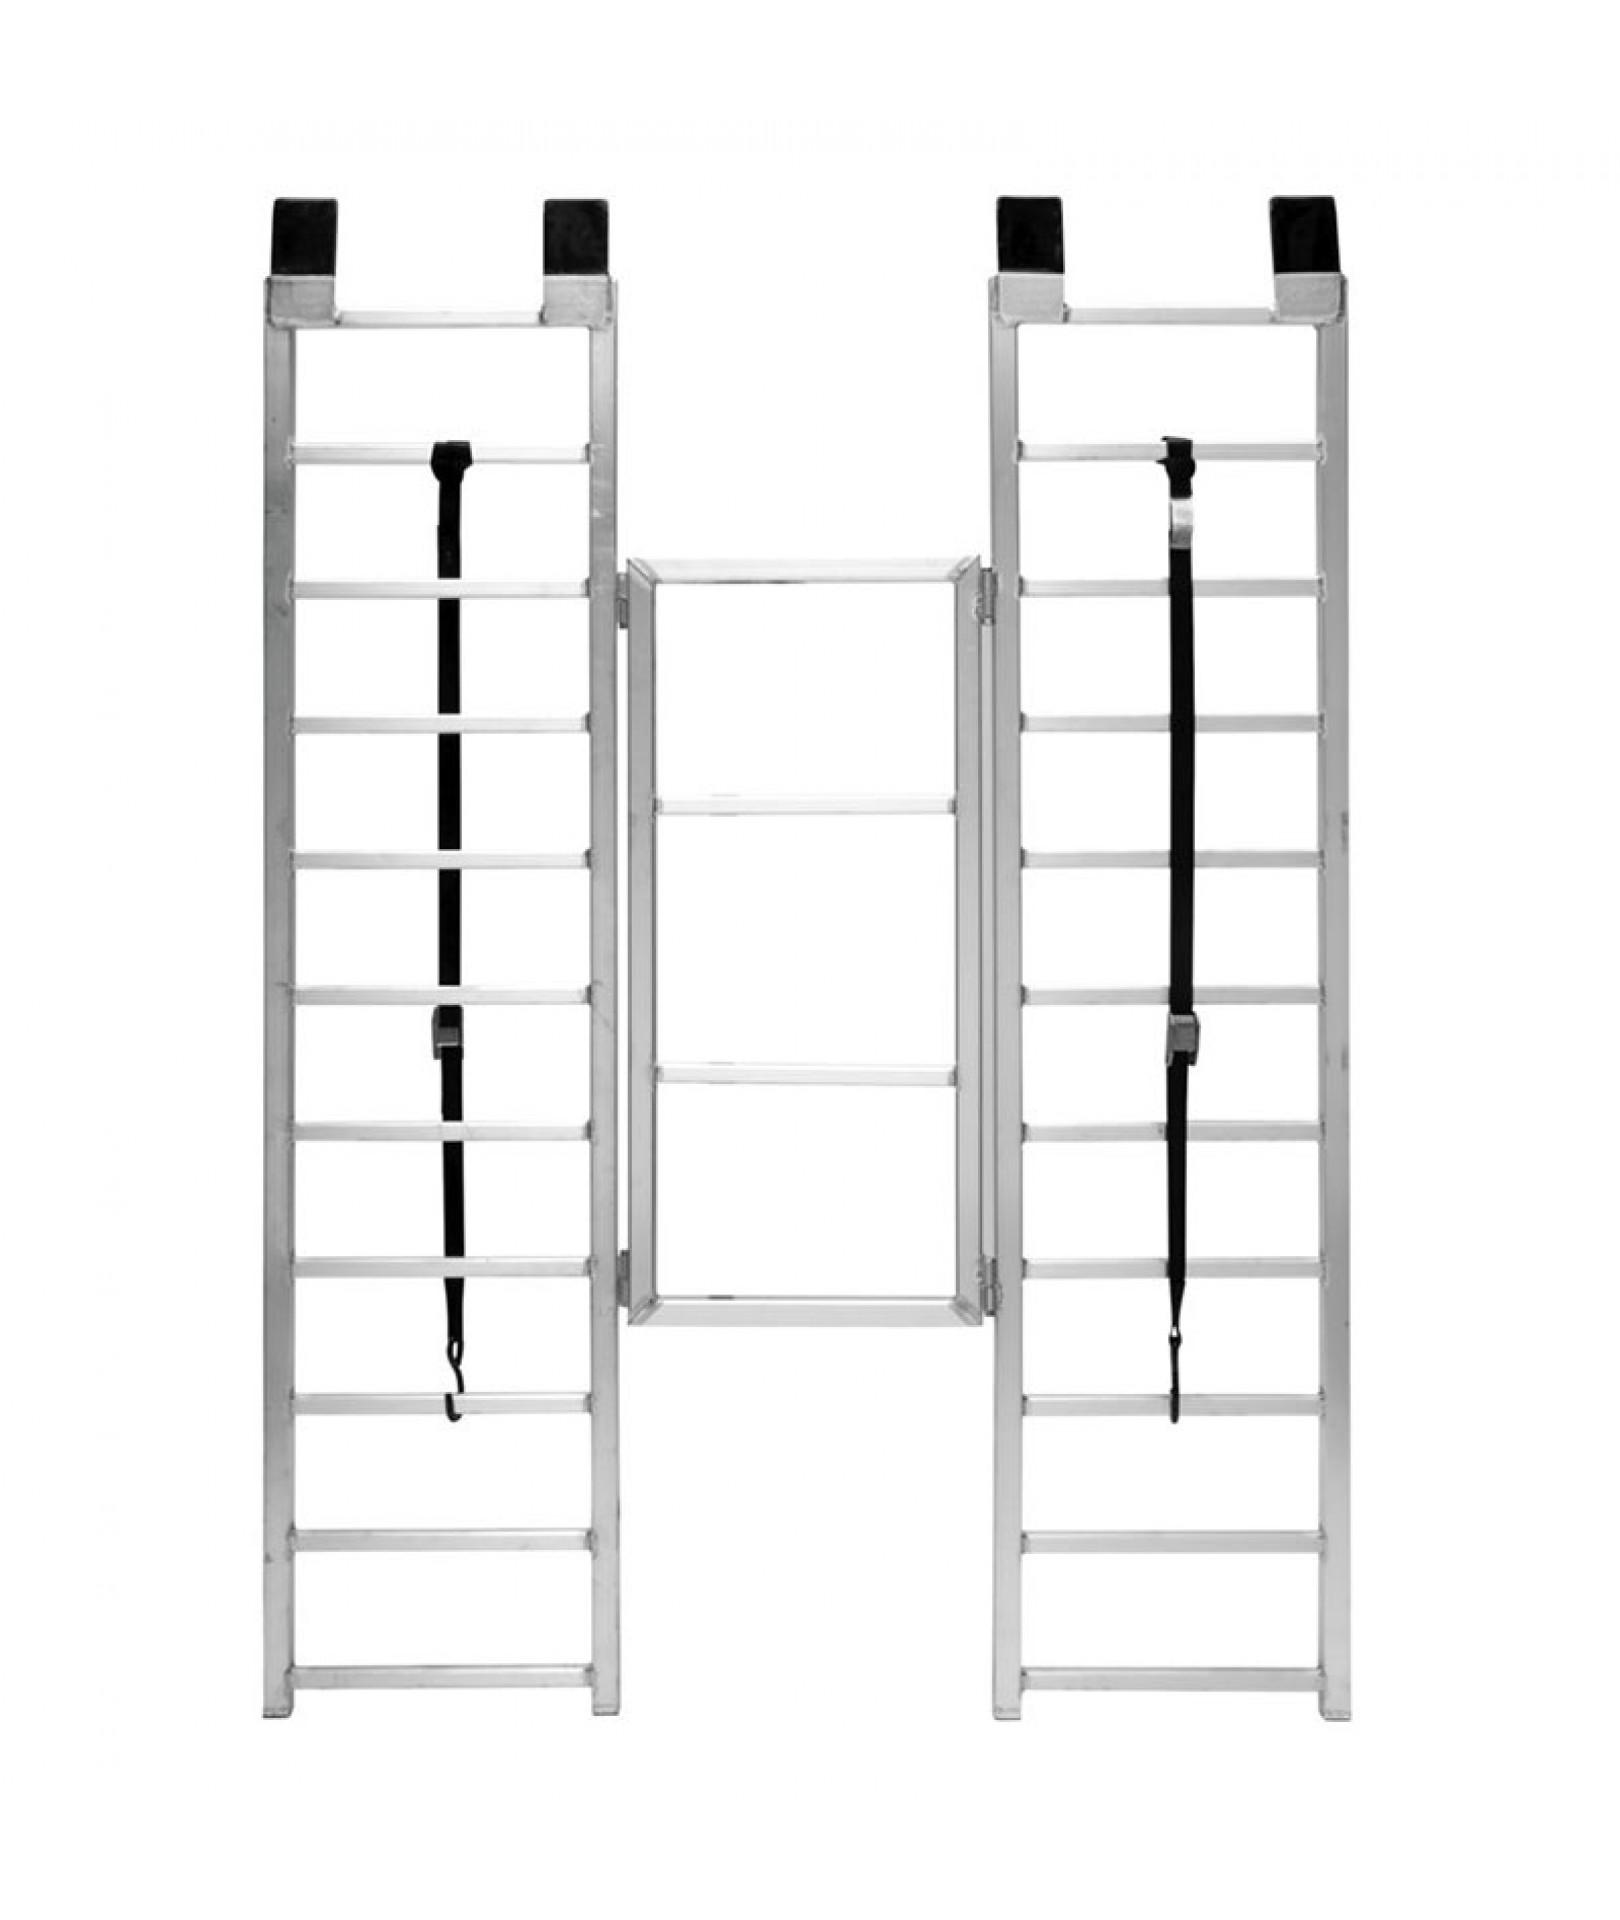 Atv Tri Fold Ramps